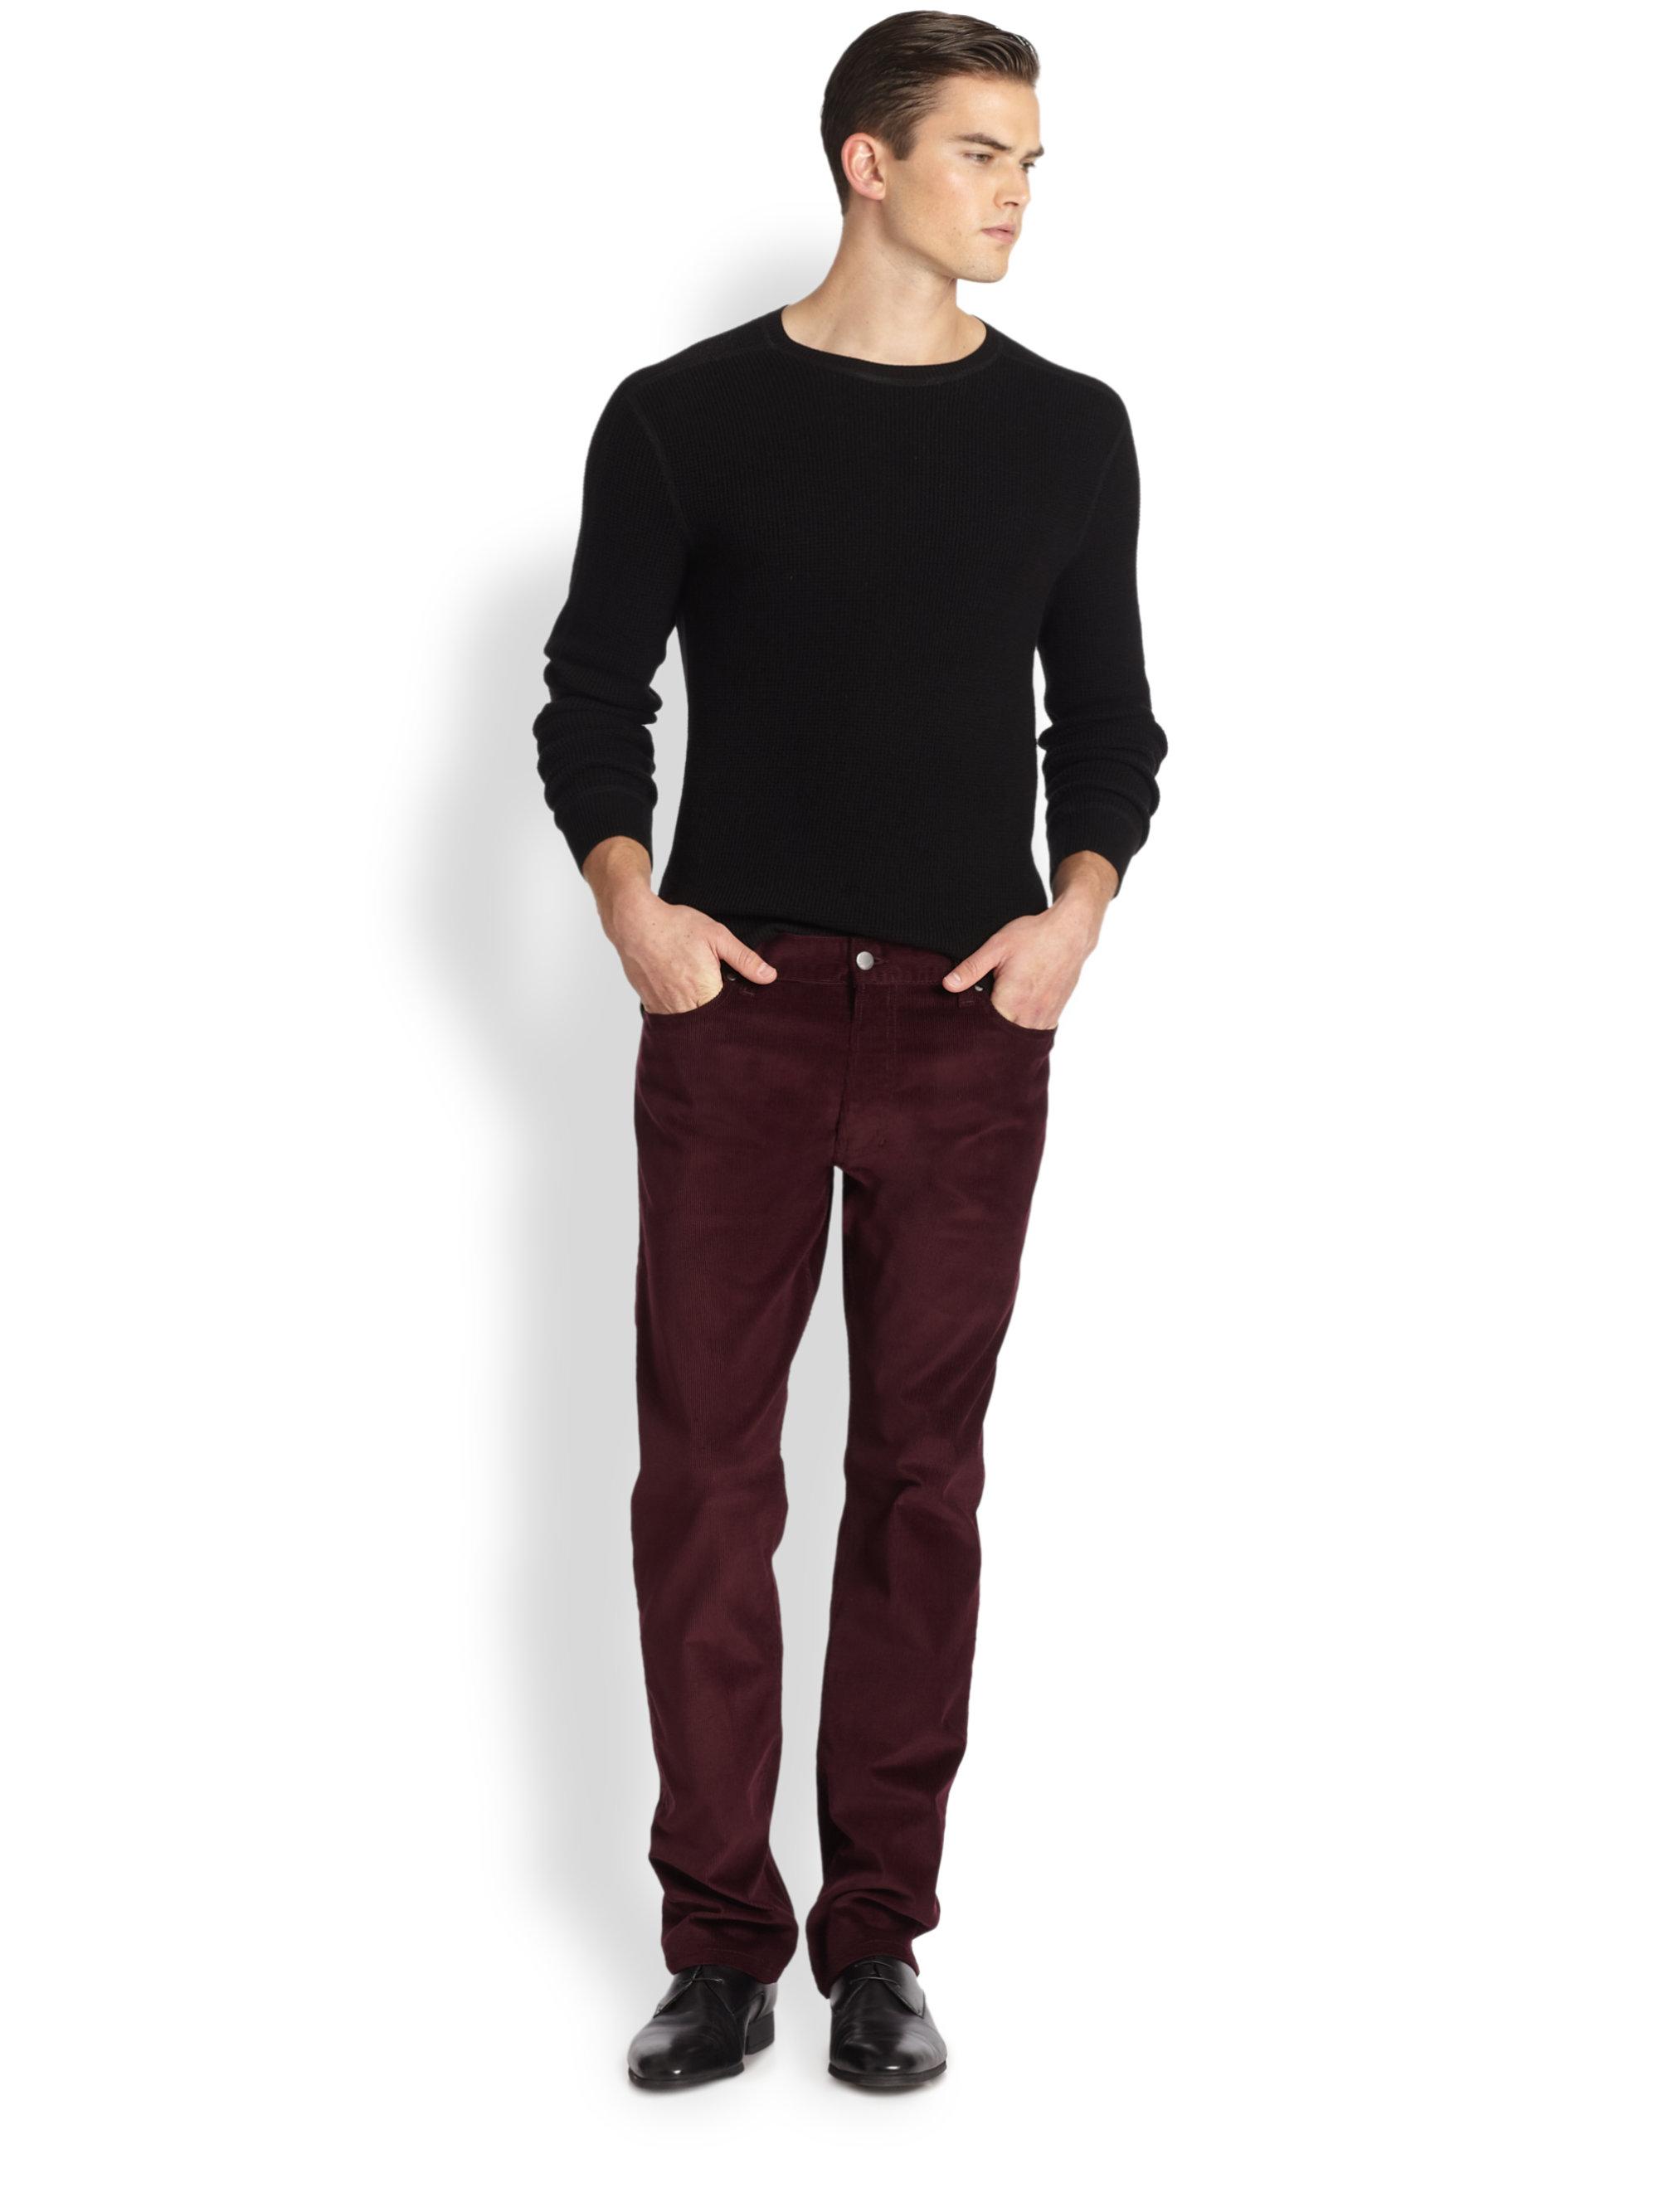 Mens Red Corduroy Pants - Fat Pants